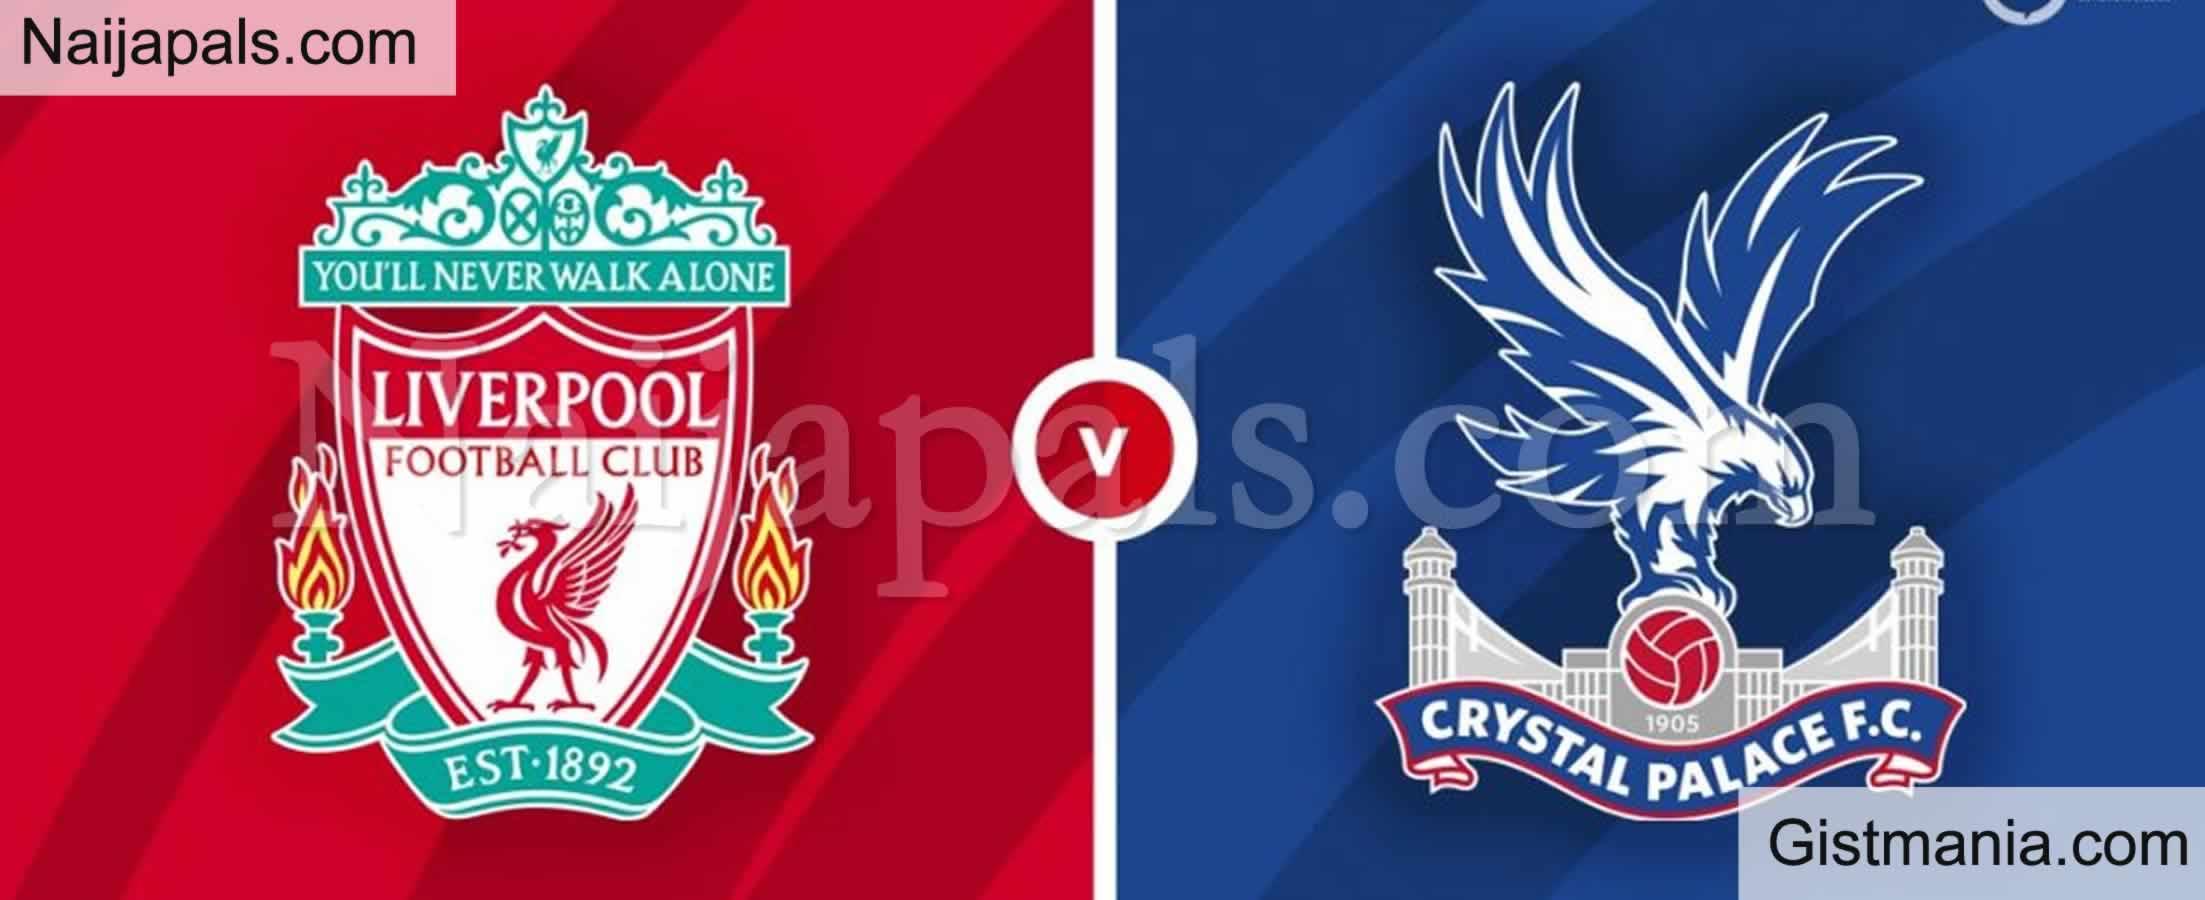 <img alt='.' class='lazyload' data-src='https://img.gistmania.com/emot/soccer.gif' /> <b>Liverpool v Crystal Palace: English Premier League Match, Team News, Goal Scorers and Stats</b>